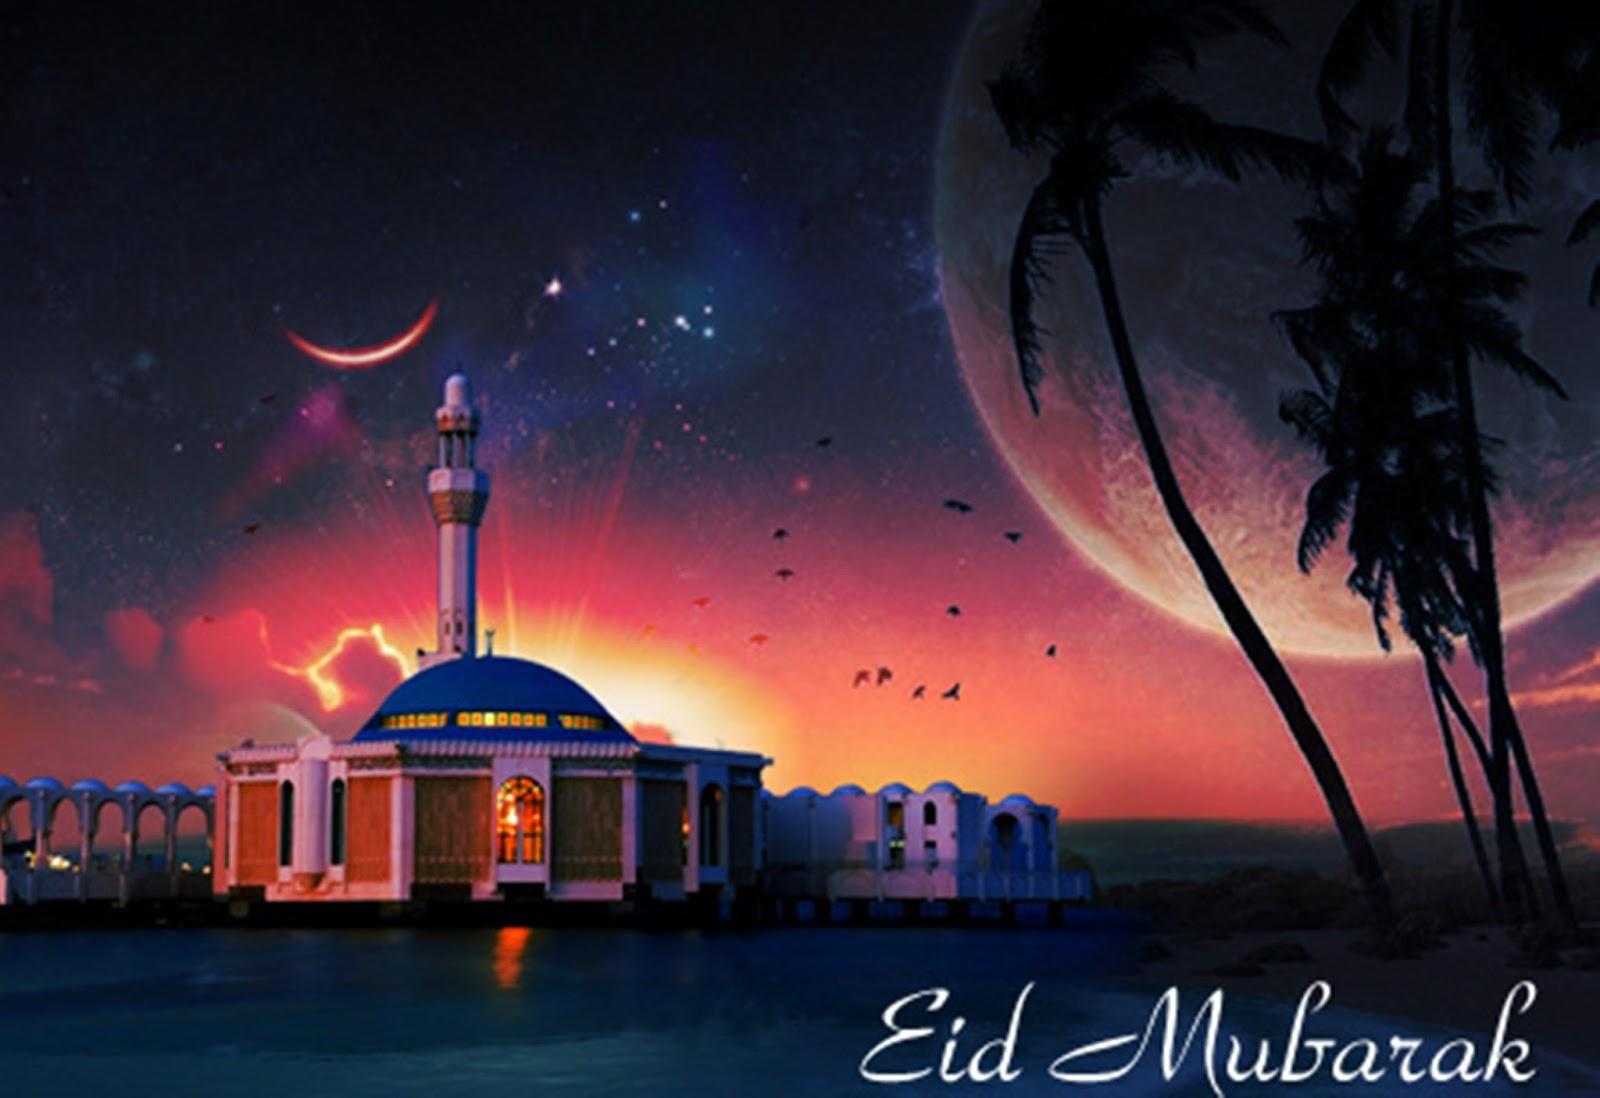 Wallpaper download eid - Eid Mubarak Wallpapers Download Free